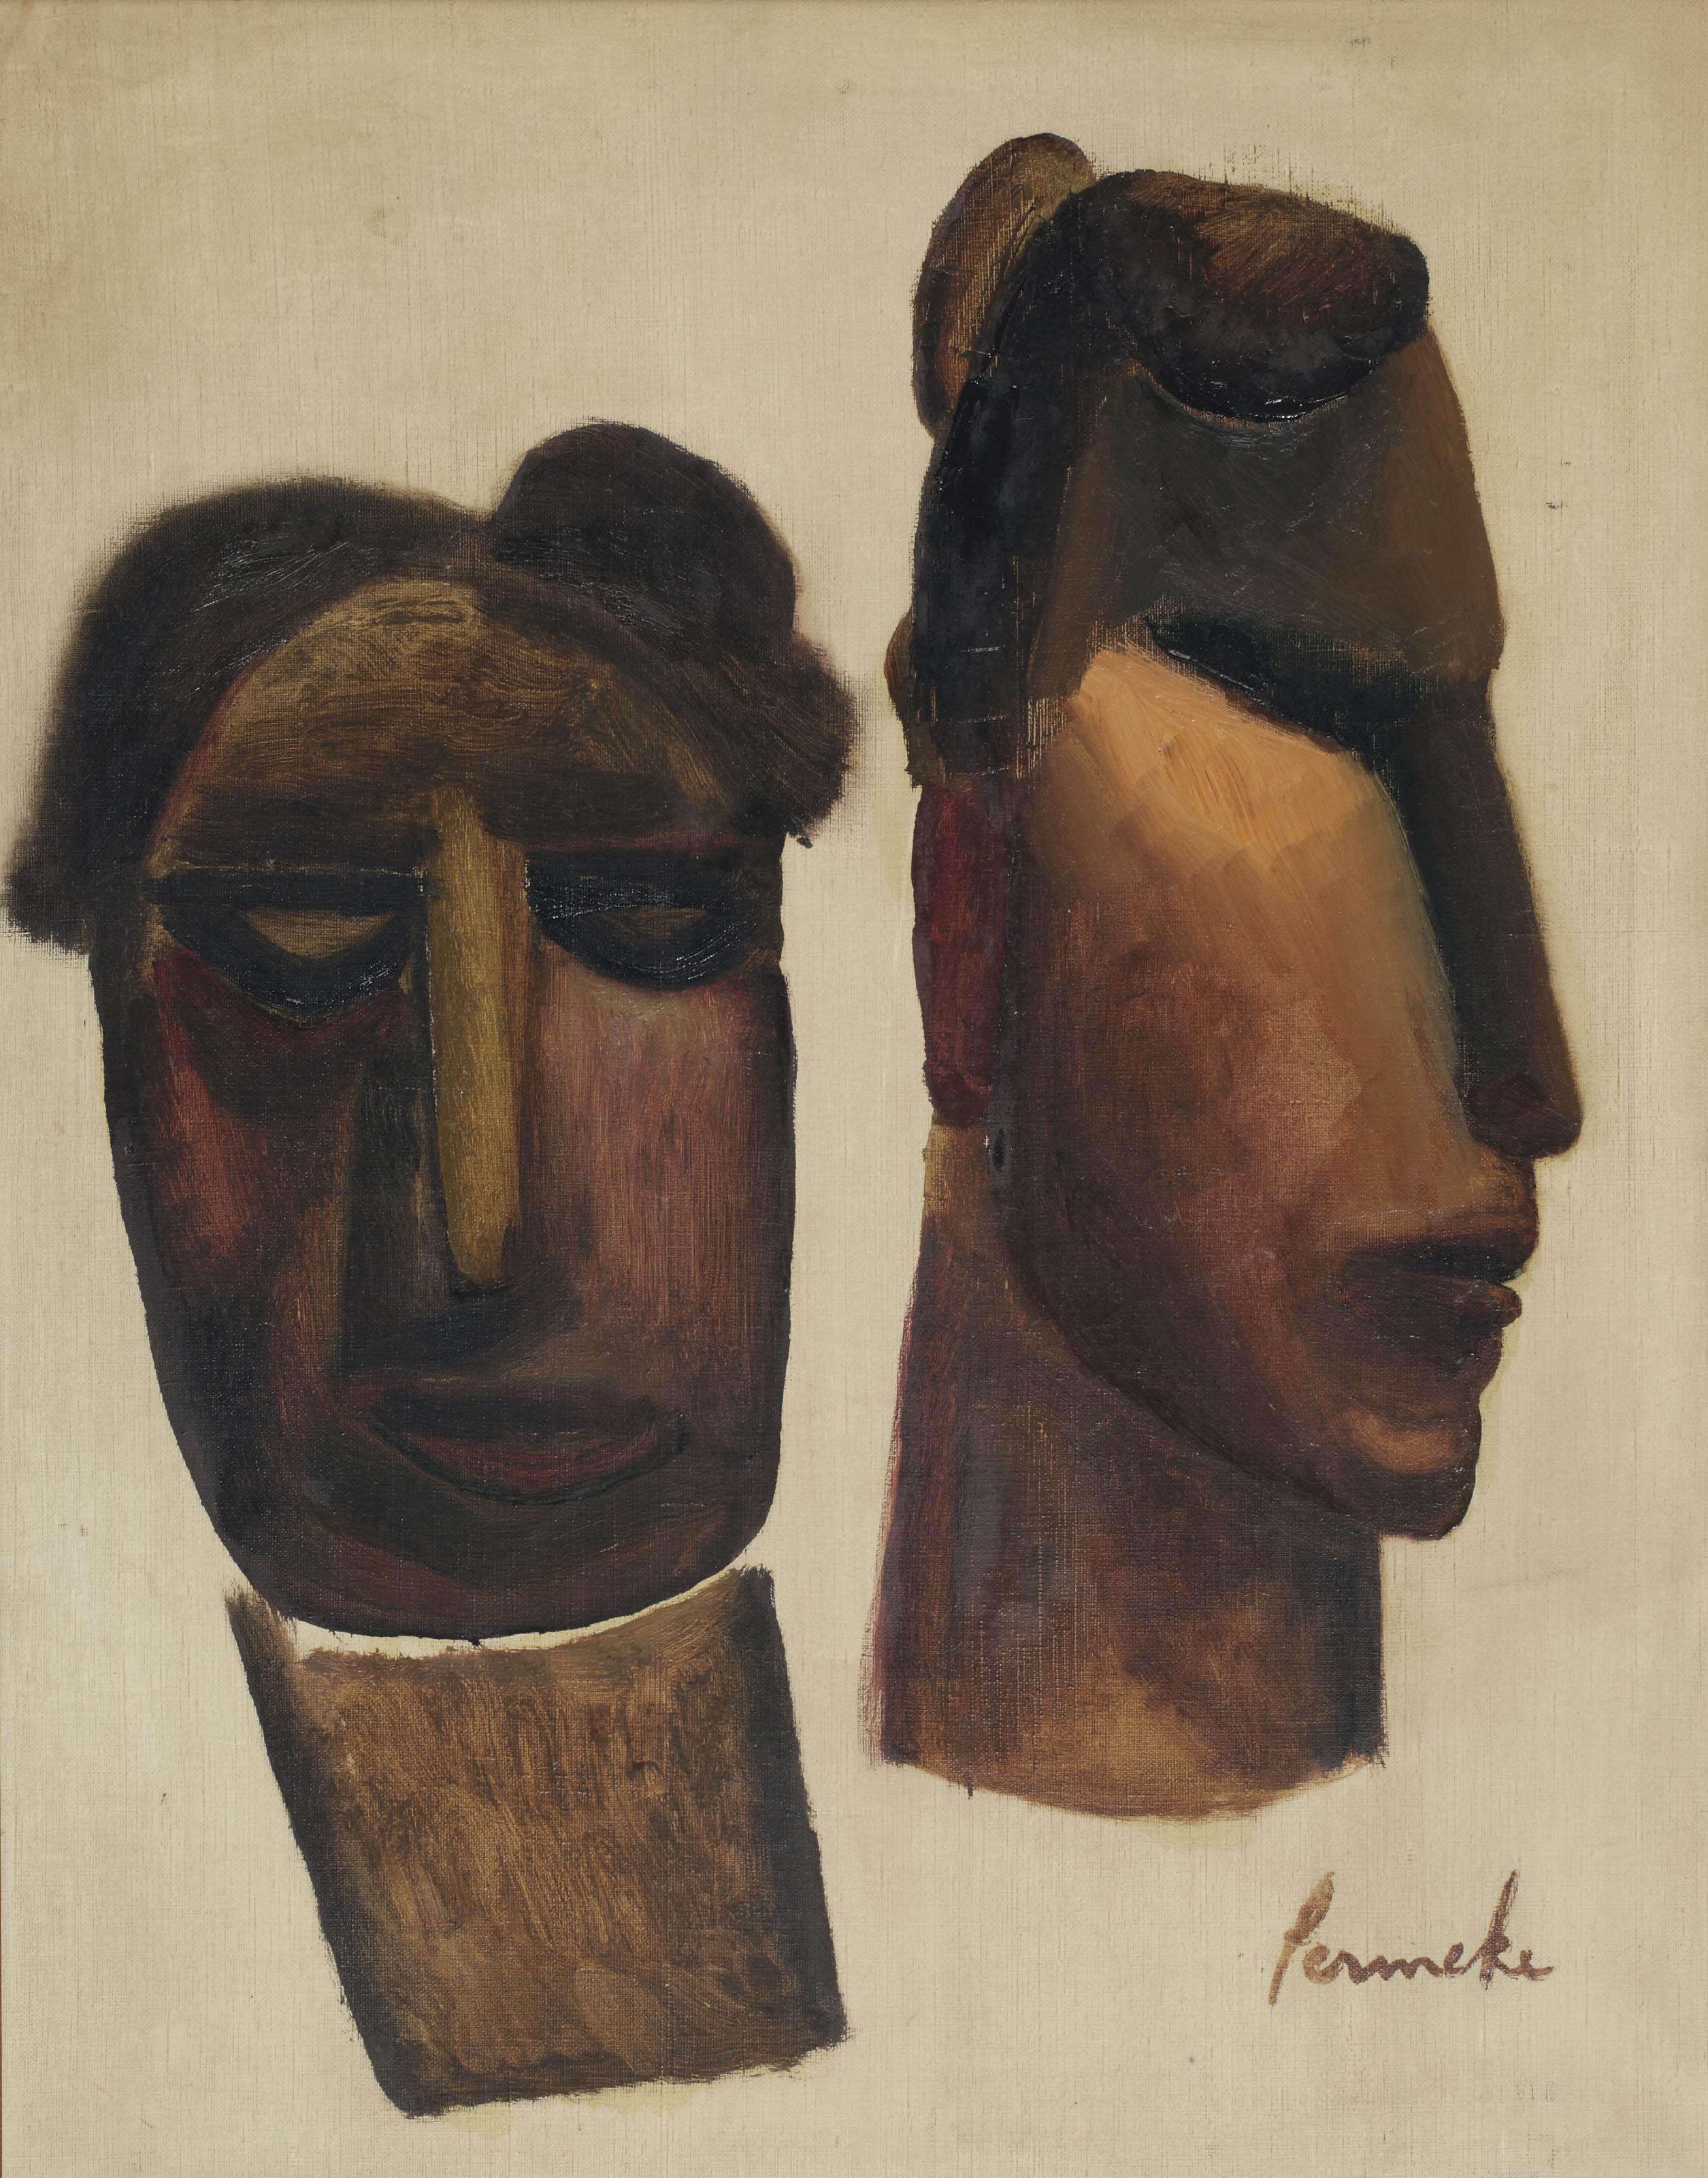 Primitive heads